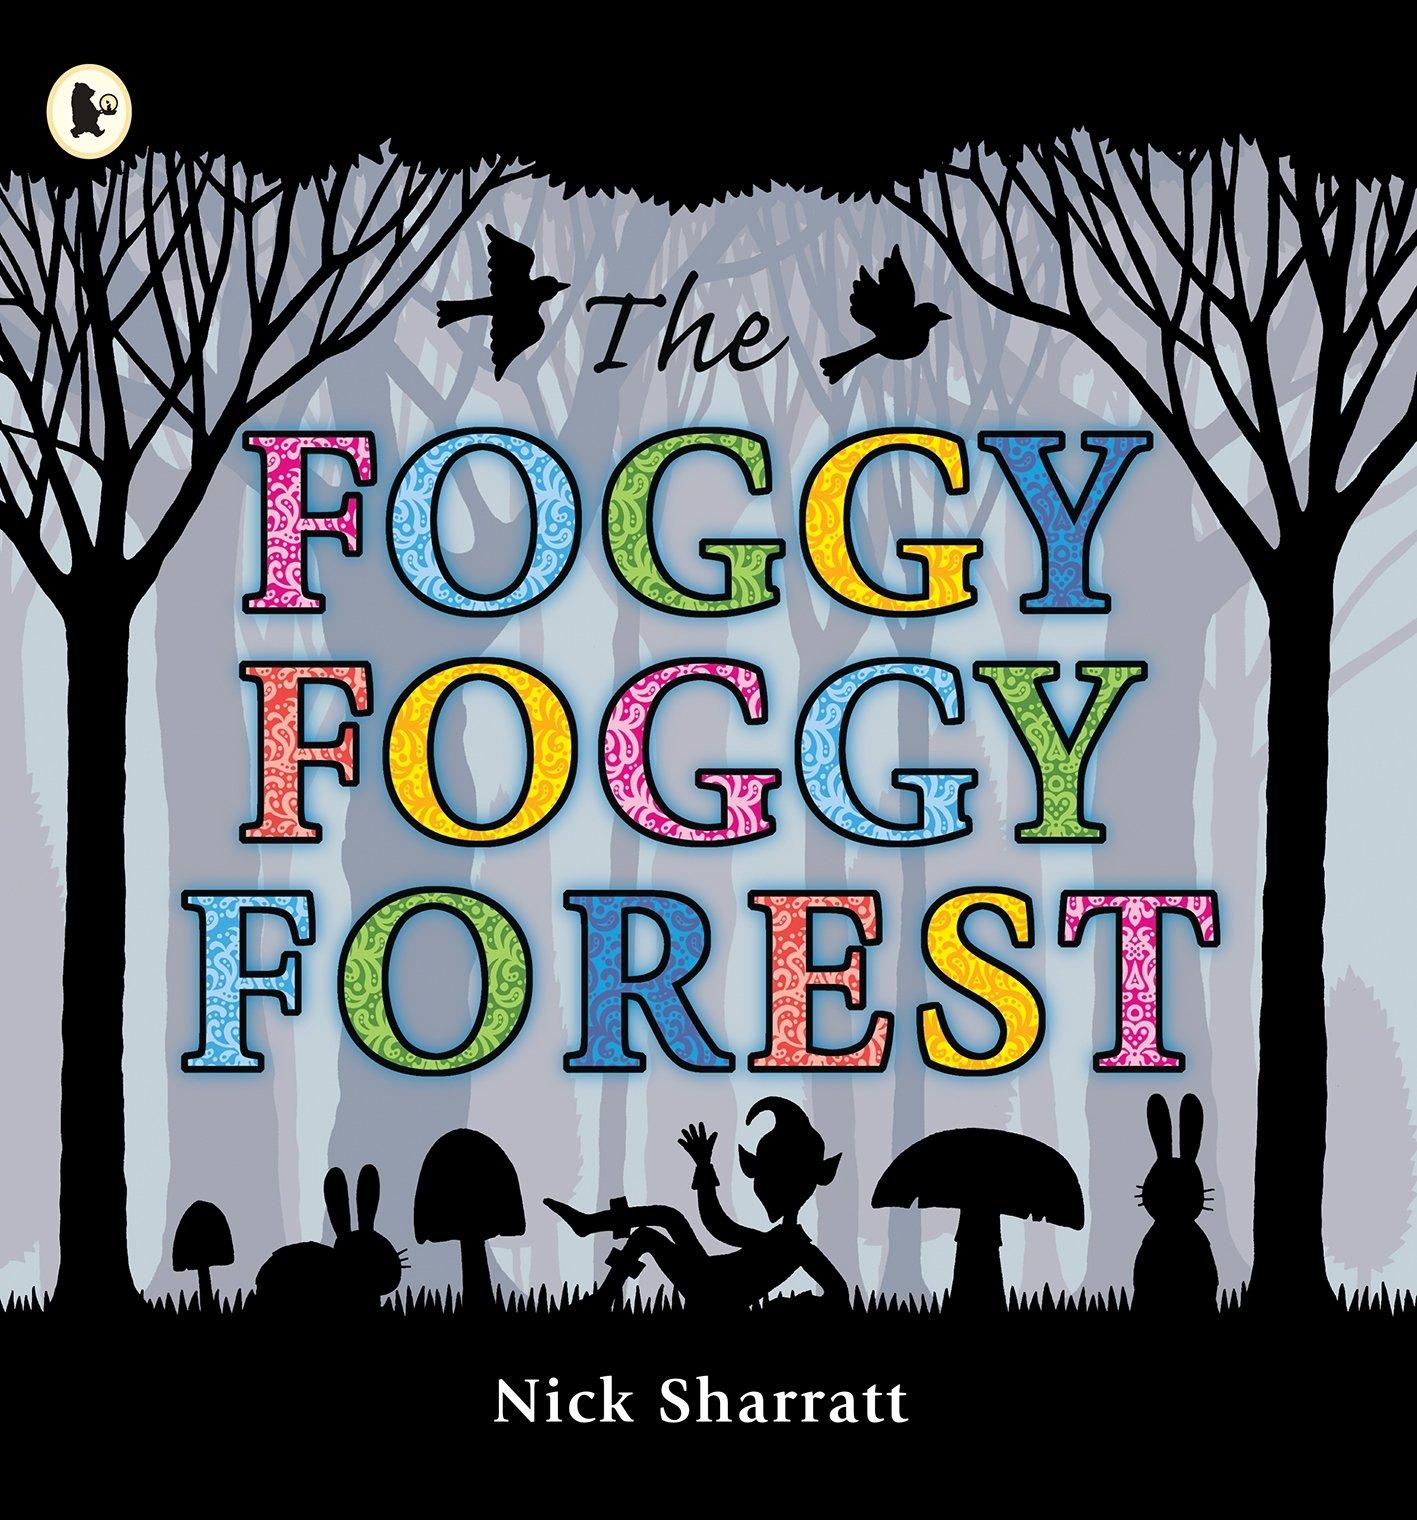 The Foggy, Foggy Forest: Nick Sharratt: 8601200503456: Amazon.com: Books